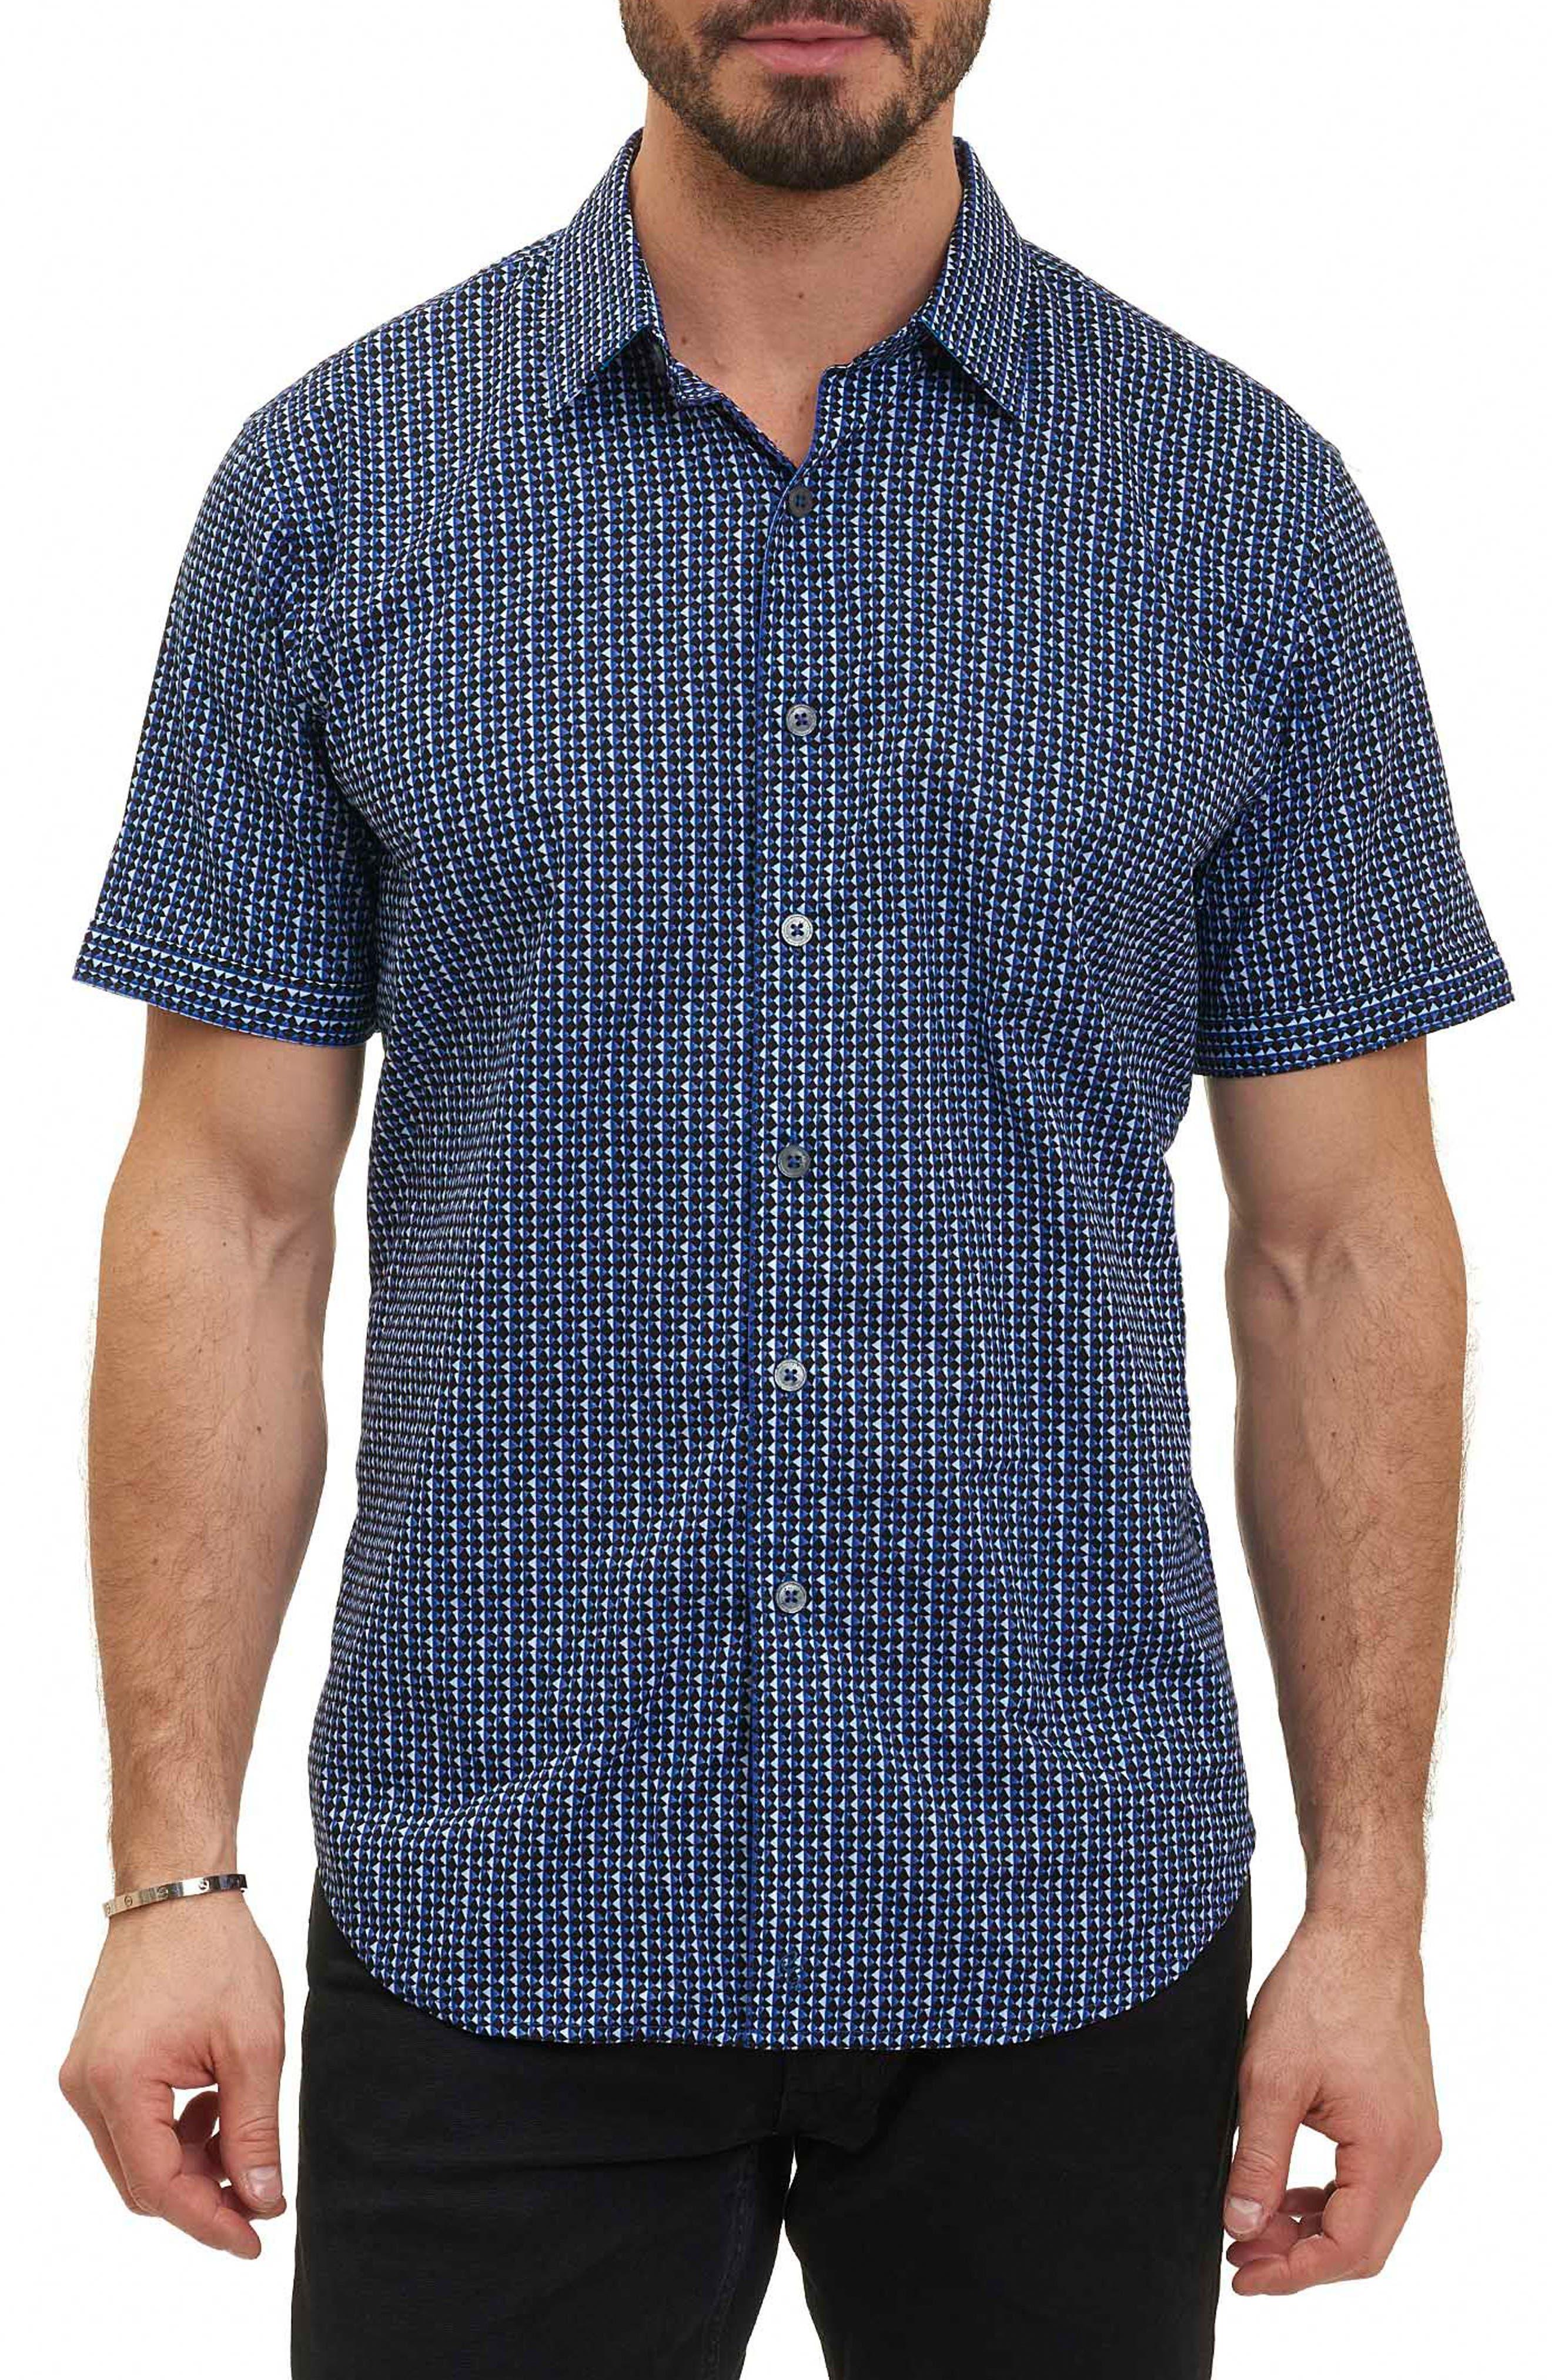 Alternate Image 1 Selected - Robert Graham Gardena Classic Fit Geo Print Short Sleeve Sport Shirt